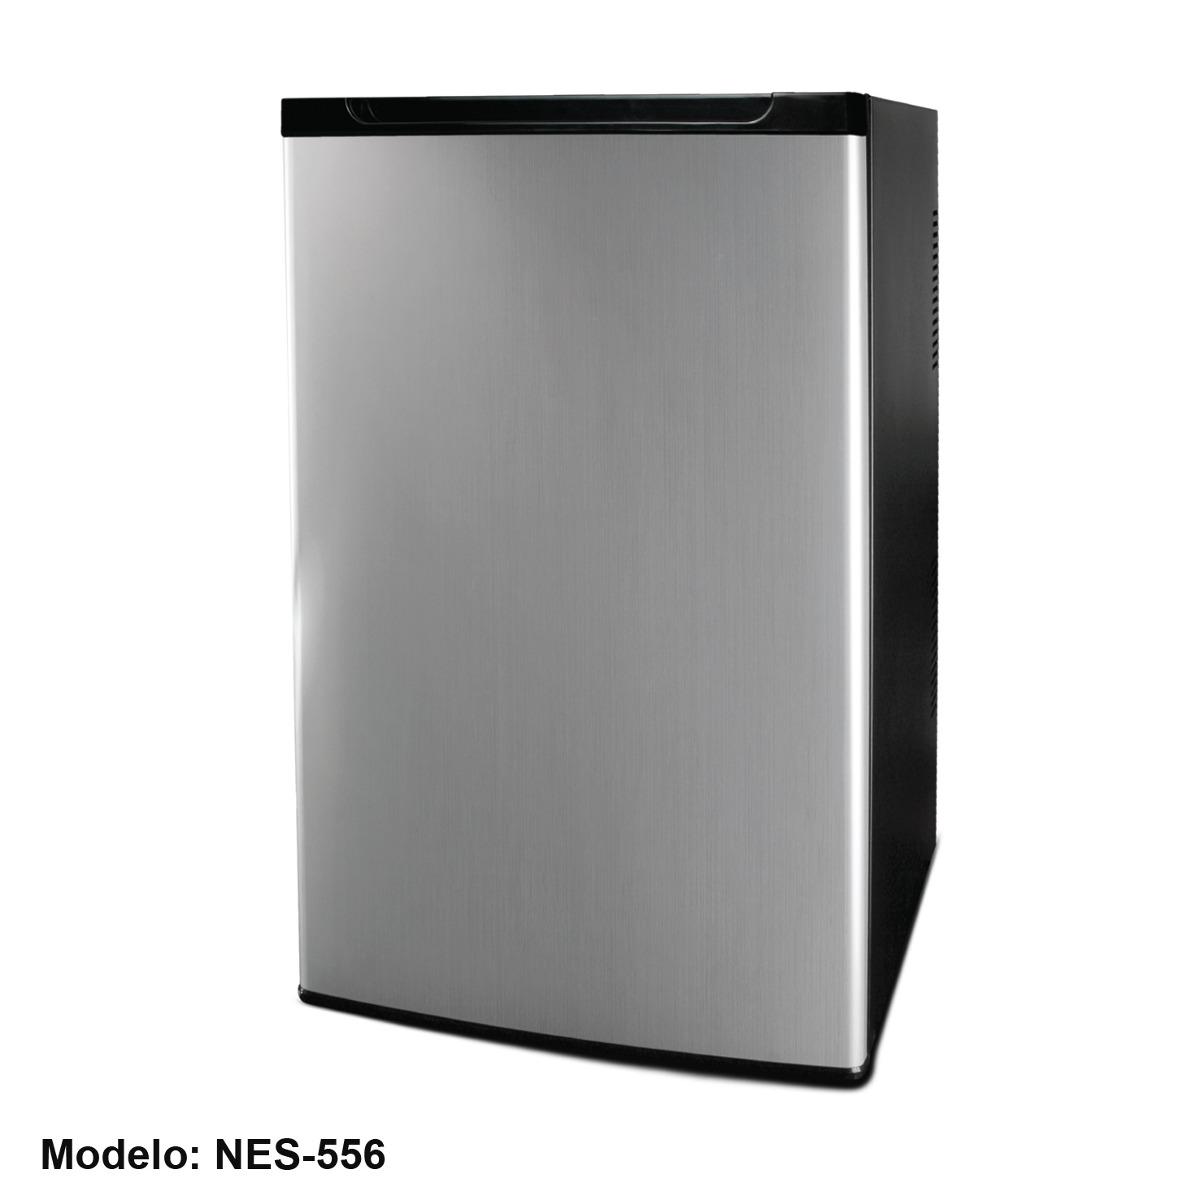 Minibar Frigobar Minirefri Refrigerador Envio Gratis  $ 3,49000 en